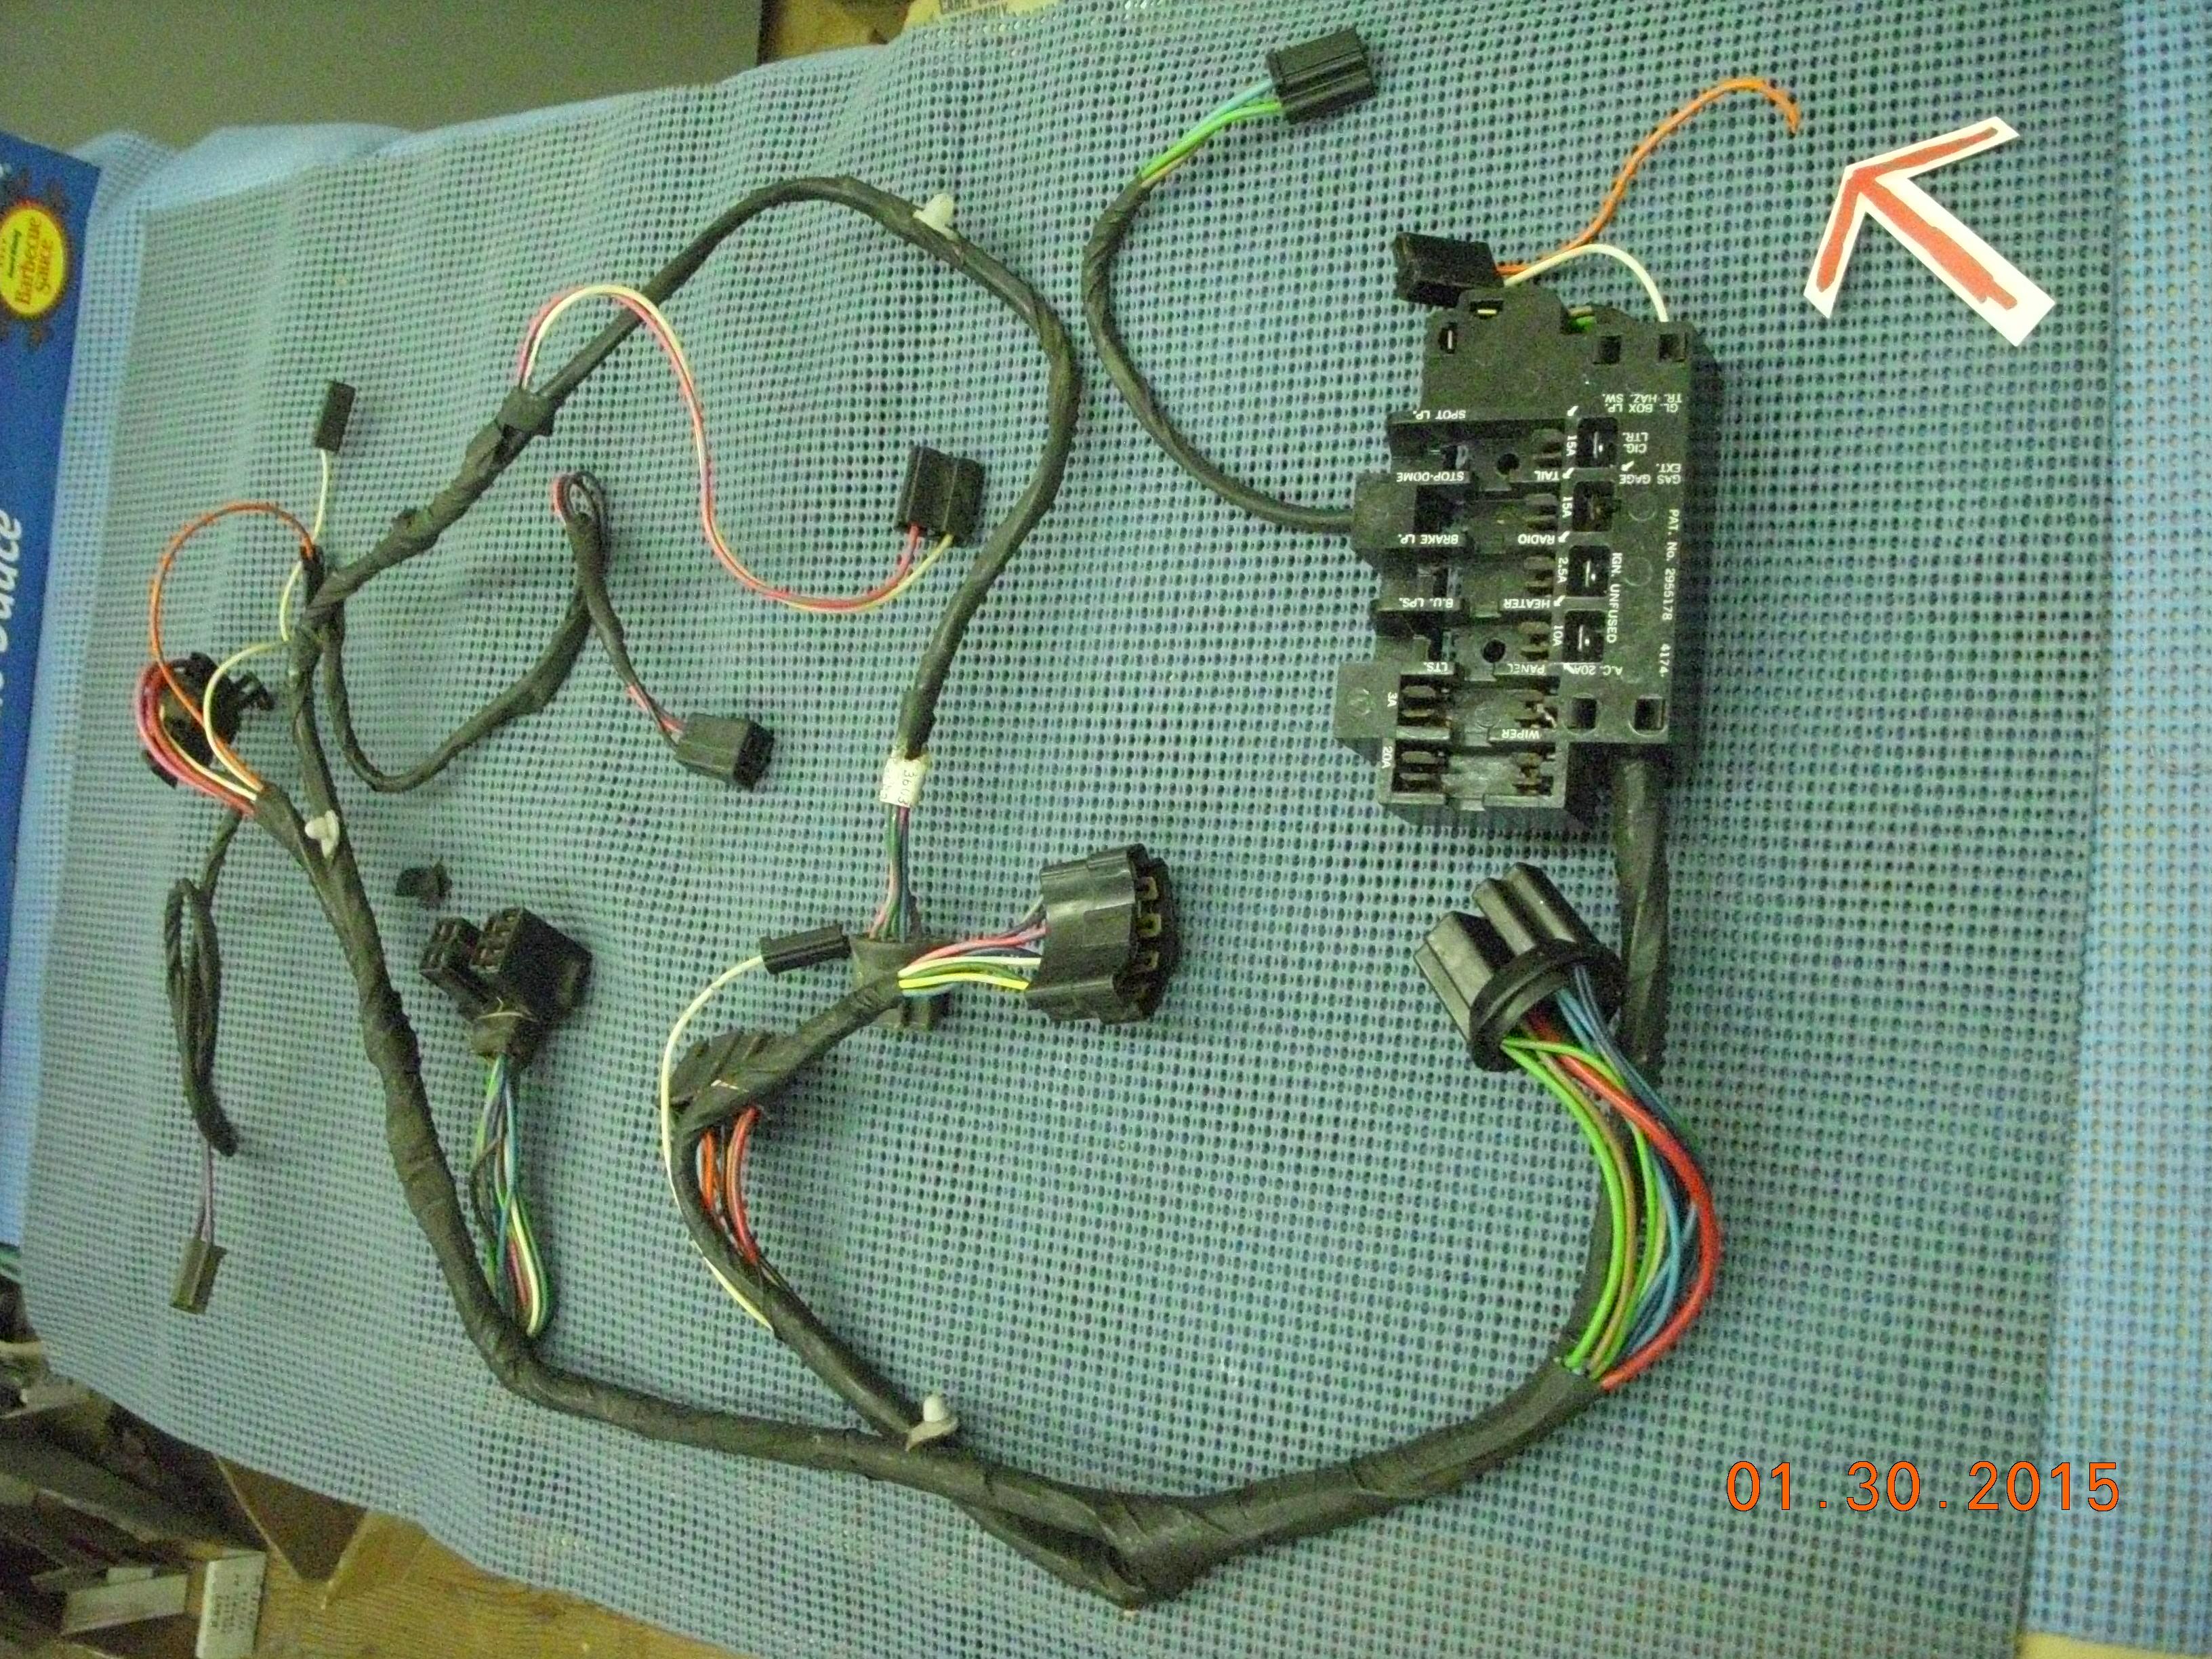 1963 gmc pickup instrument panel wiring harness assembly nos rh  oldsobsolete com 1962 GMC Pickup 1972